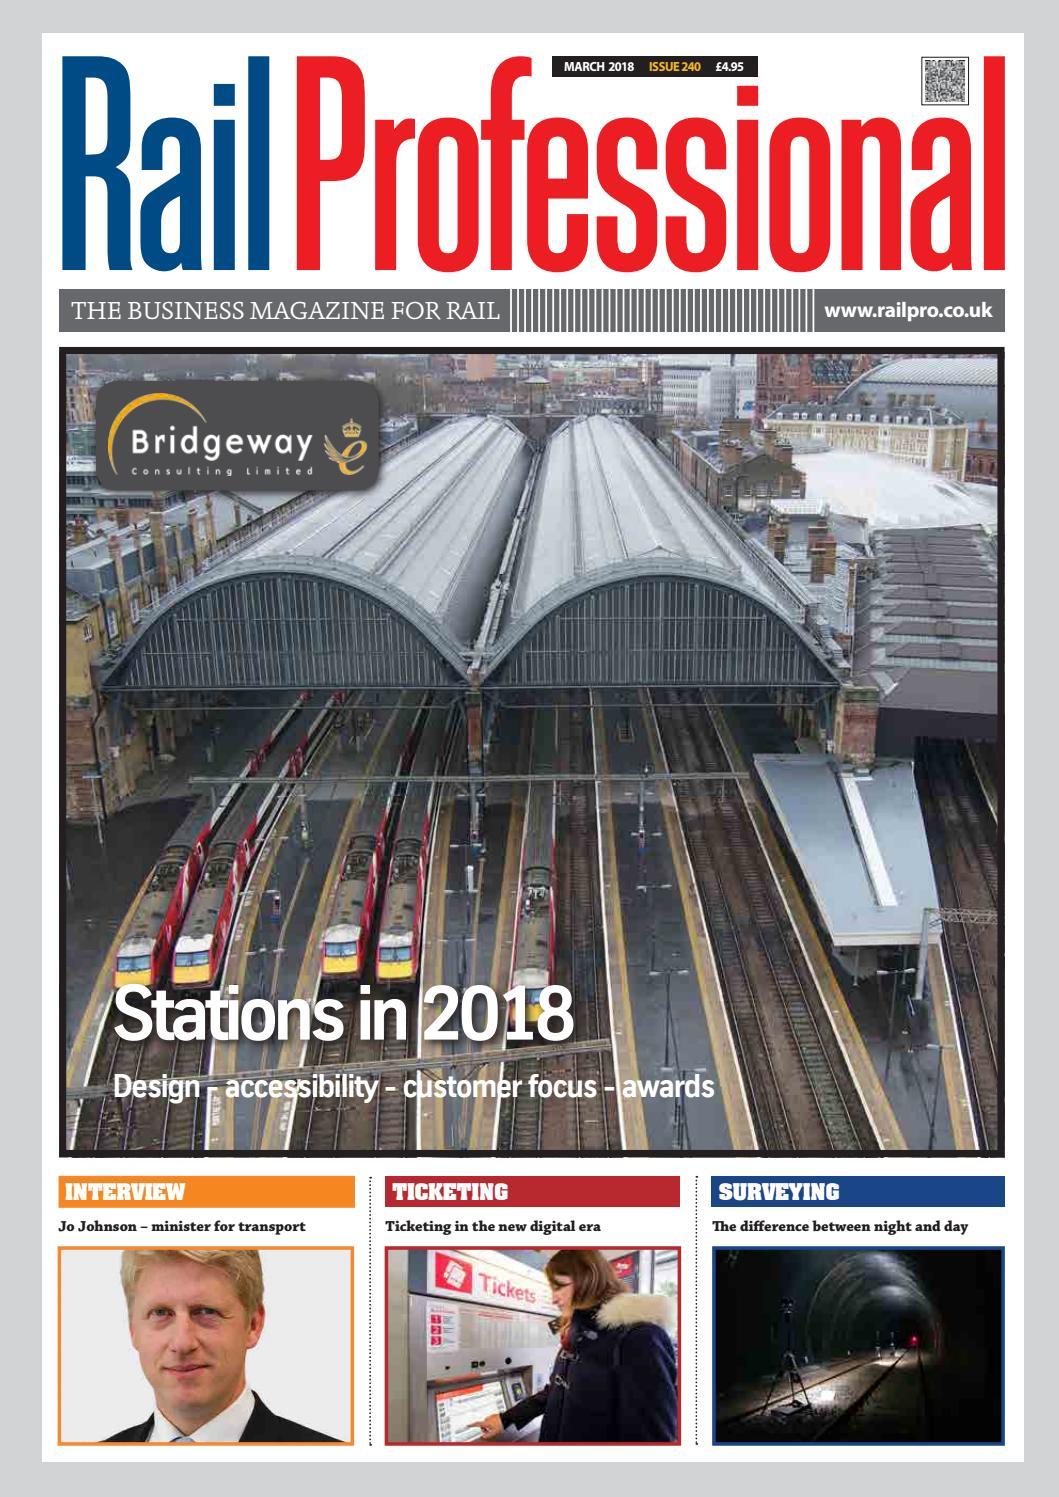 Rail Professional March 2018 by Rail Professional Magazine - issuu